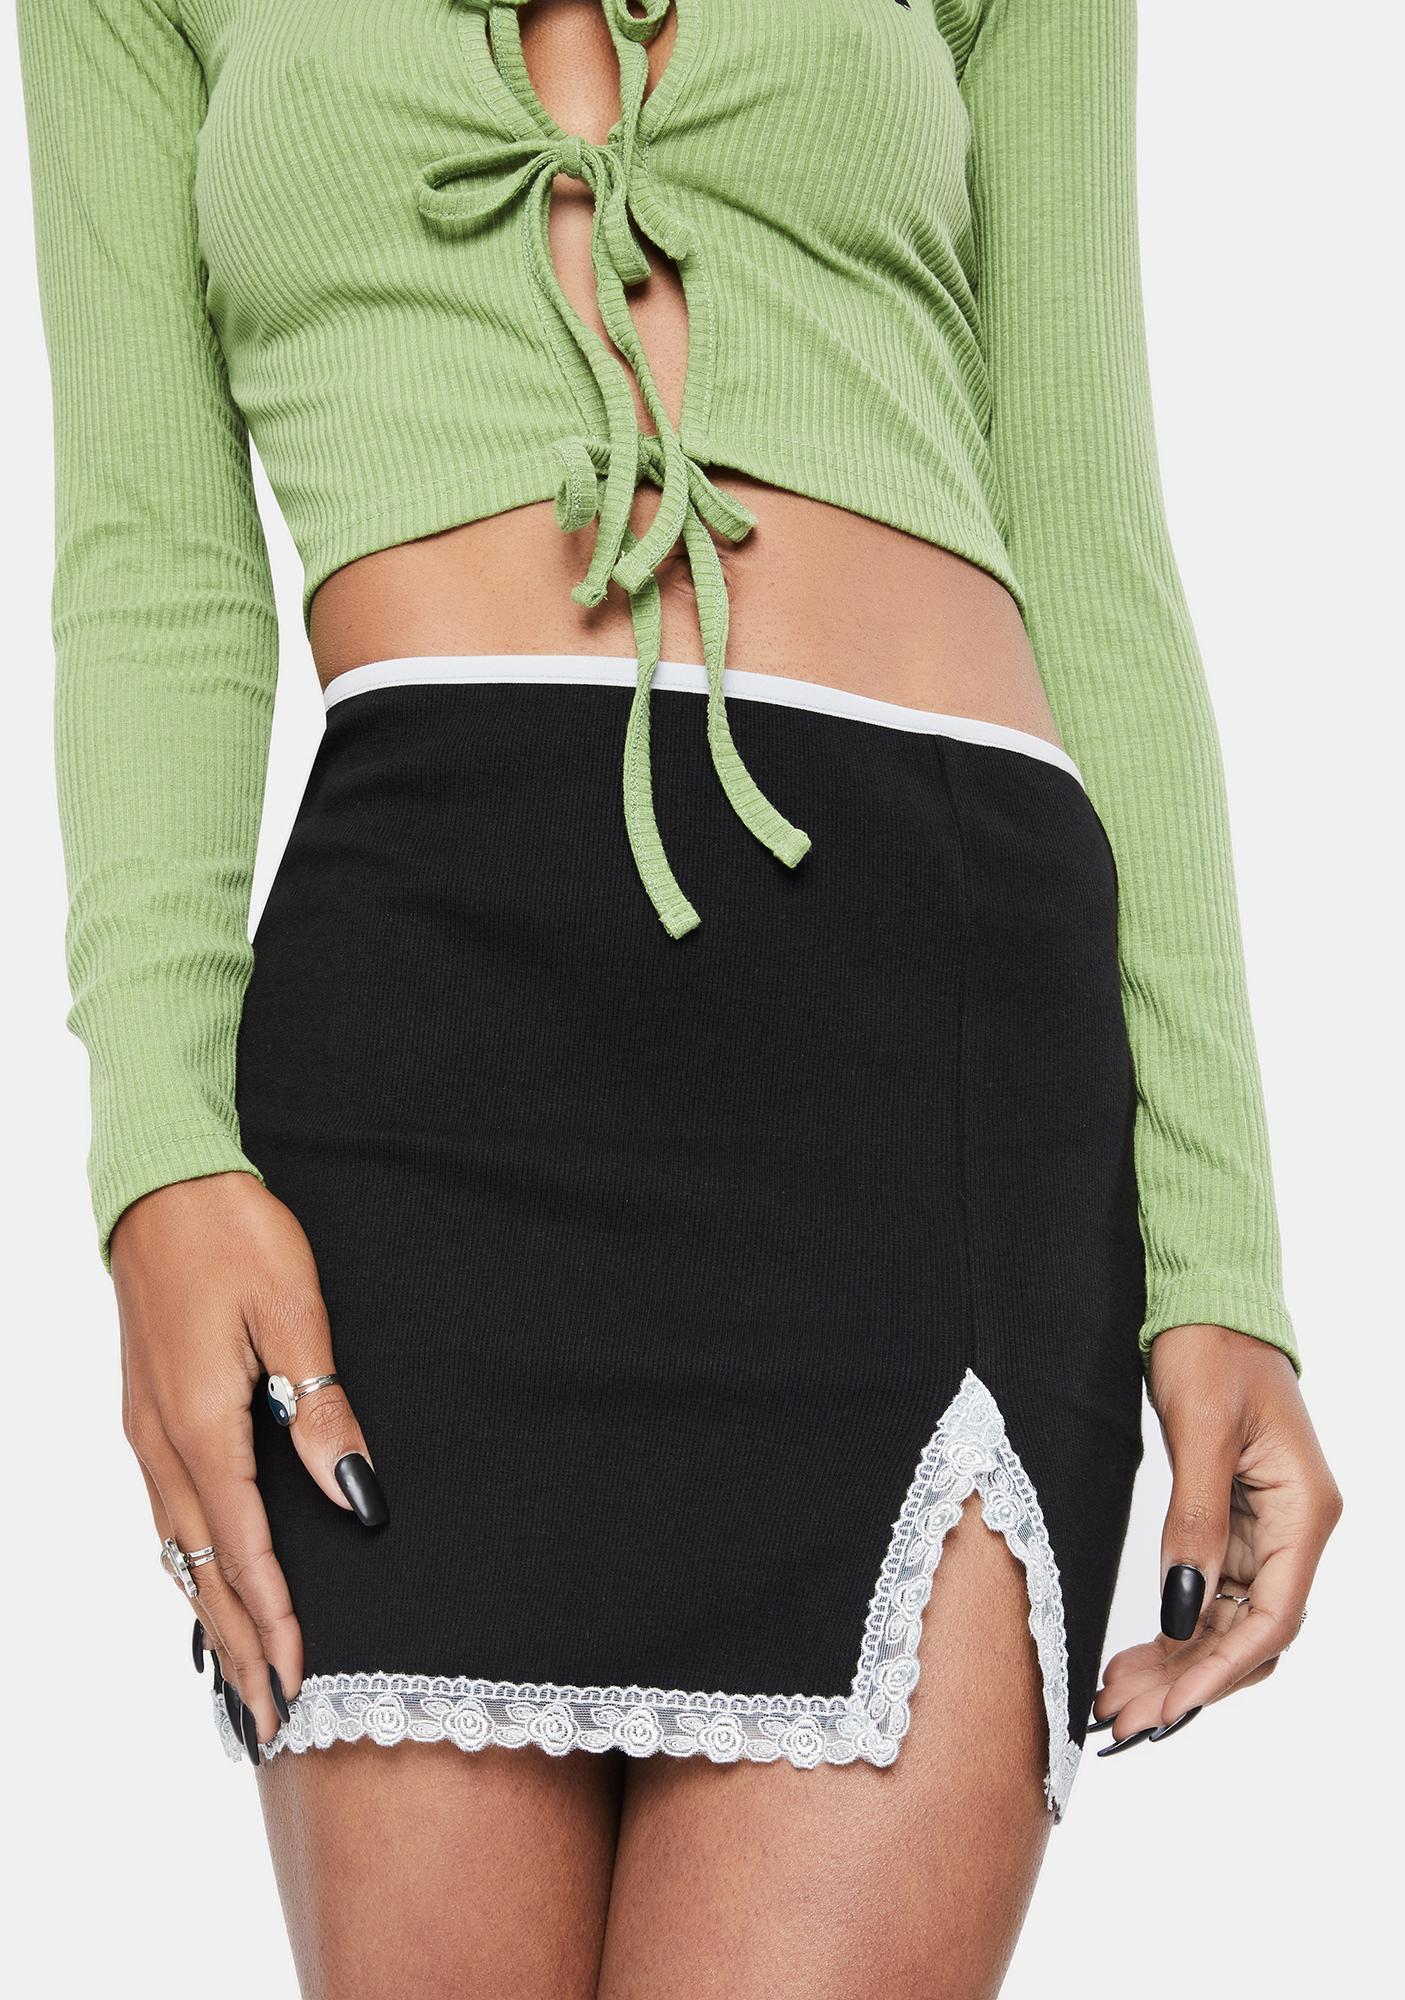 BADEE Lace Trim Mini Skirt